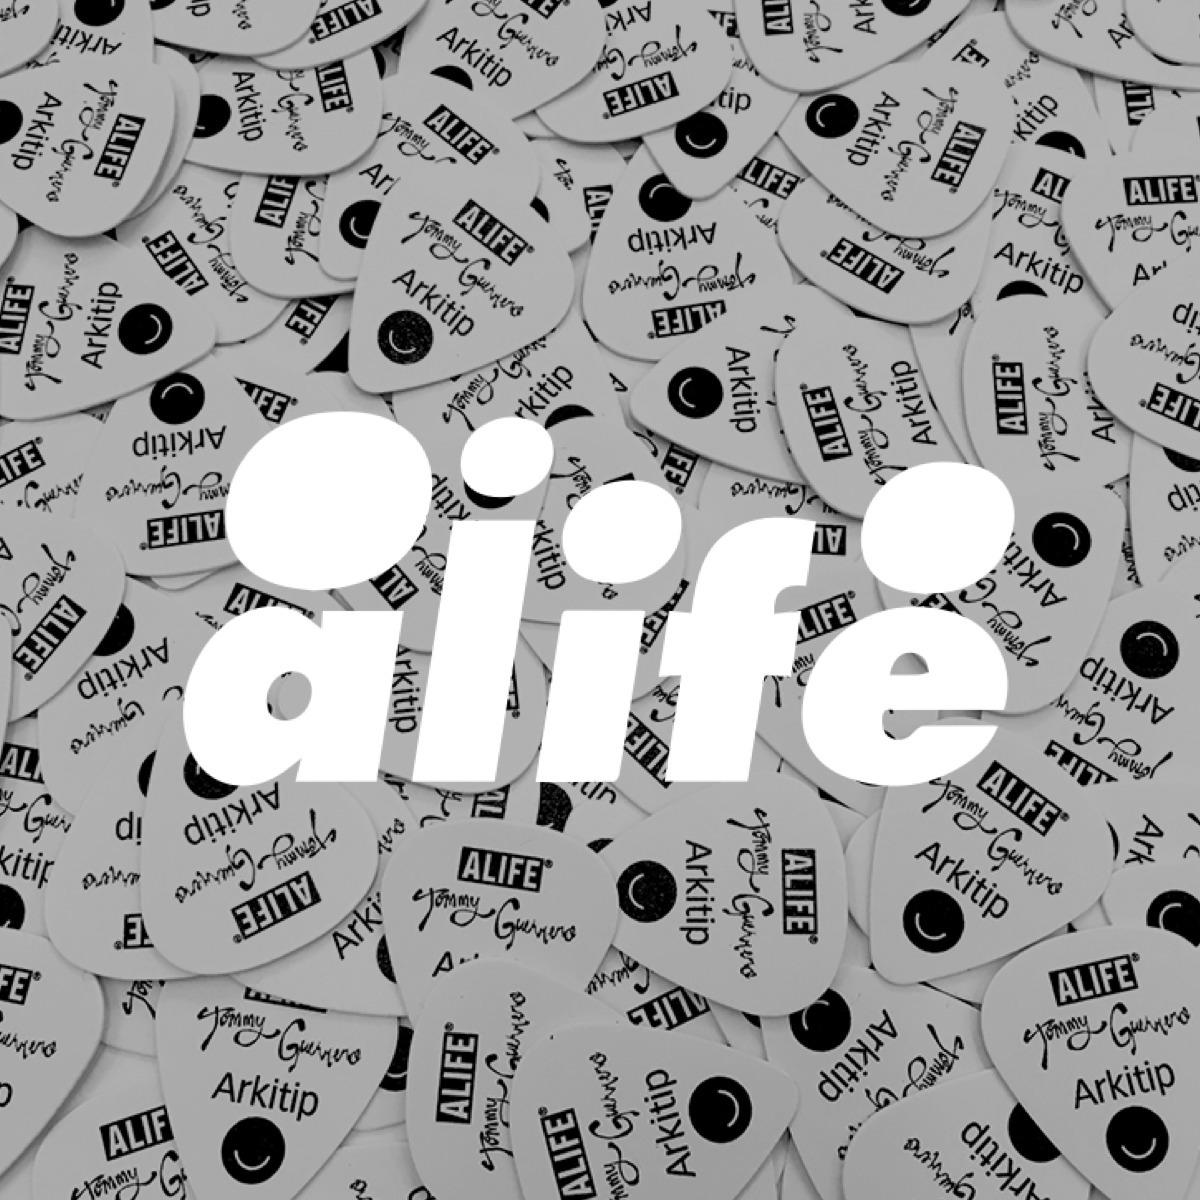 Alife Sessions™ ©2016